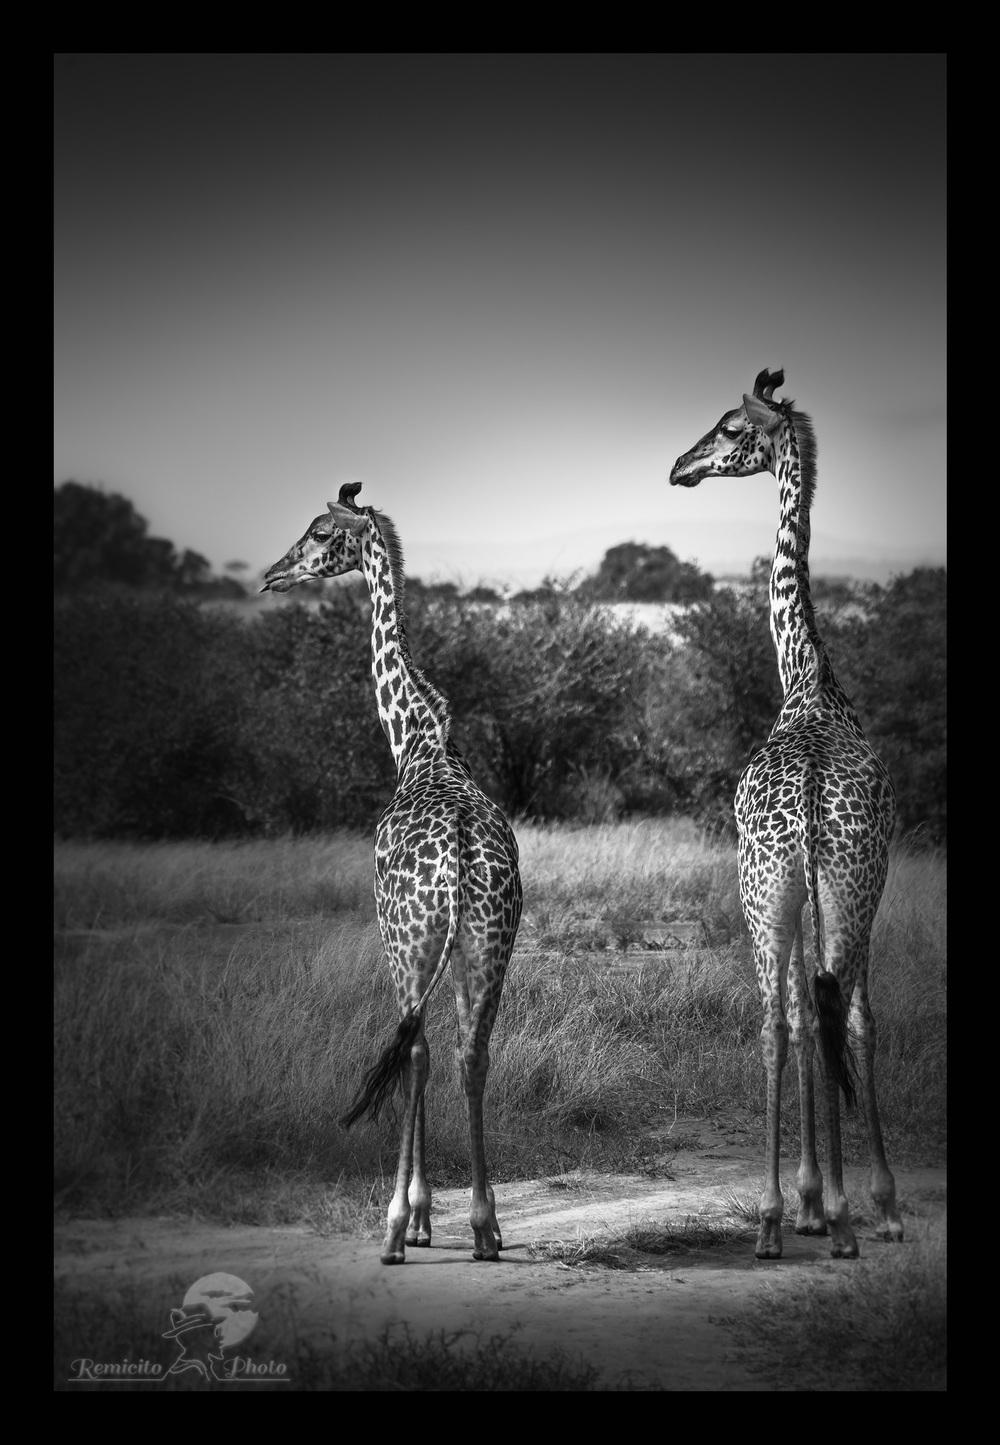 remicito photo 19-07-2016, July 19, 1çth July, 19 Juillet, 19 de Julio, photo savane, photo afrique, photo safari afrique, photo safari kenya, photo safari tanzanie, photo afrique noir et blanc, photo noir et blanc kenya, photo noir et blanc tanzanie, photo noir et blanc Masai mara, photo serengeti, photo voyage afrique, photo voyage kenya, photo voyage tanzanie, photo savane afrique, photo savane kenya, Photo savane tanzanie, belle photo afrique, acheter photo afrique, tirage photo afrique, acheter photo kenya, acheter photo tanzanie, tirage photo safari, jolie photo savane, offrir photo afrique, acheter photo girafe, cadeau photo noir et blanc  Giraffe Africa, black and white africa, black and white africa photo, kenya photograph, kenya savanna photo, tanzania photograph, kenya savanna photographs, tanzania savanna Photo, best africa shot, best africa photo, best giraffe shot, best giraffe photo, best giraffe photograph, buy photo africa, africa gift photo, giraffe gift photo, buy giraffe photo, buy africa giraffe photo,  foto blanco y negro, foto jirafa, foto africa regalo, comprar foto africa, offrecer foto africa, africa maravilla, africa linda, foto kenya, foto tanzania, jirafa africa, jirafa sabana, jirafa Kenya, jirafa Tanzania,  photo noir et blanc paysage, black and white photo, black and white photography, offrir photo noir et blanc, beautiful black and white photo, offrecer foto blanco y negro  photo décoration mur, photo décoration chambre, photo décoration toilettes, cadeau décoration, idée cadeau décoration, idée cadeau pour lui, idée cadeau pour elle, idée cadeau photo mariage, idée cadeau photo nouvel appart, idée cadeau photo nouvel appartement, idée cadeau photo nouvelle maison, idée cadeau photo décoration, idée cadeau originale, idée cadeau fête des pères, idée cadeau fête des mères, idée cadeau naissance, idée cadeau anniversaire, idée cadeau anniversaire homme, idée cadeau anniversaire femme, idée cadeau noël, idée cadeau noel, idée cadeau gra